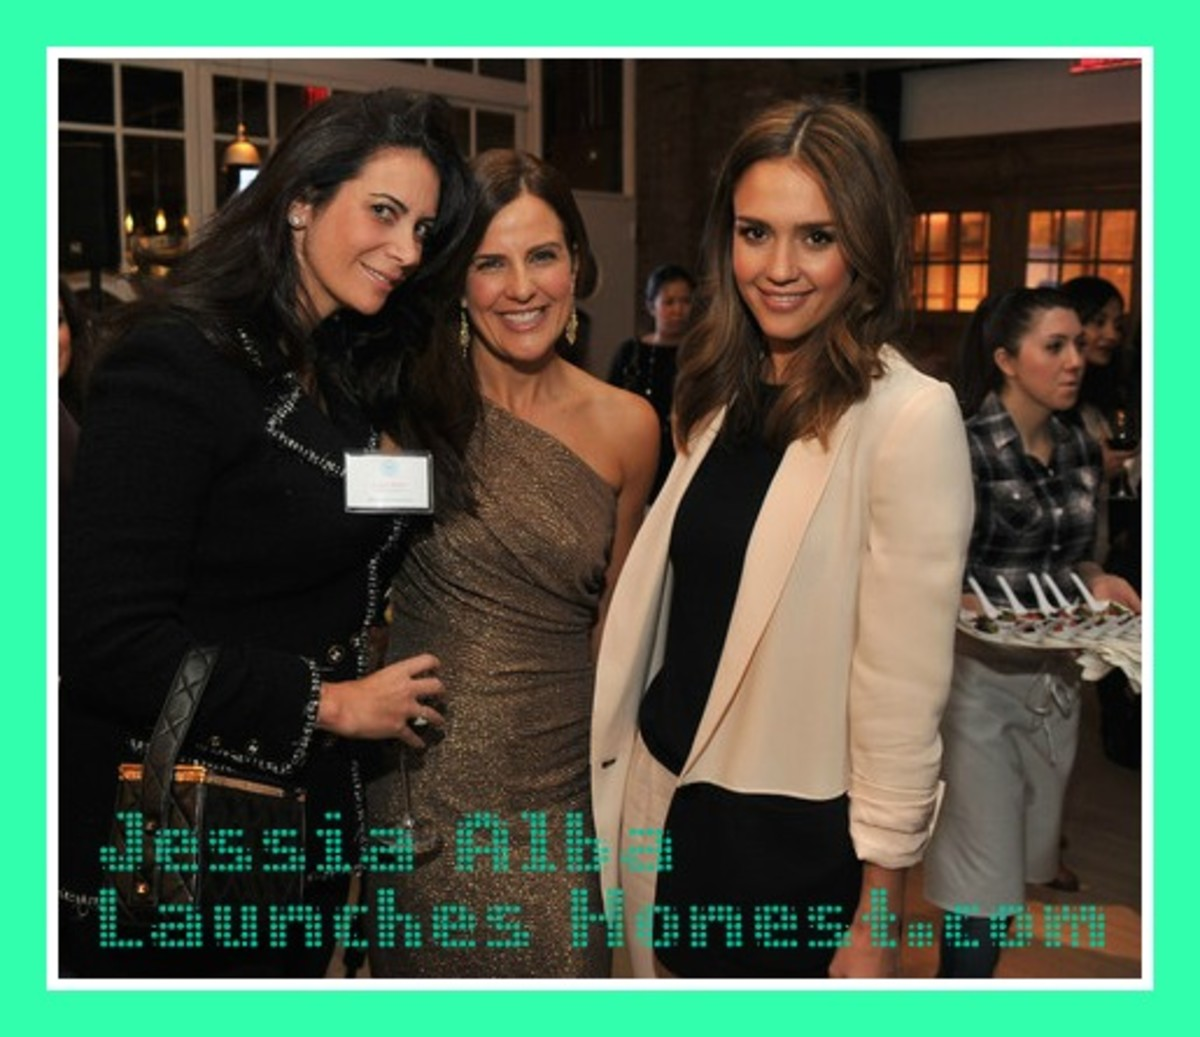 Nicole & Jessica launch2